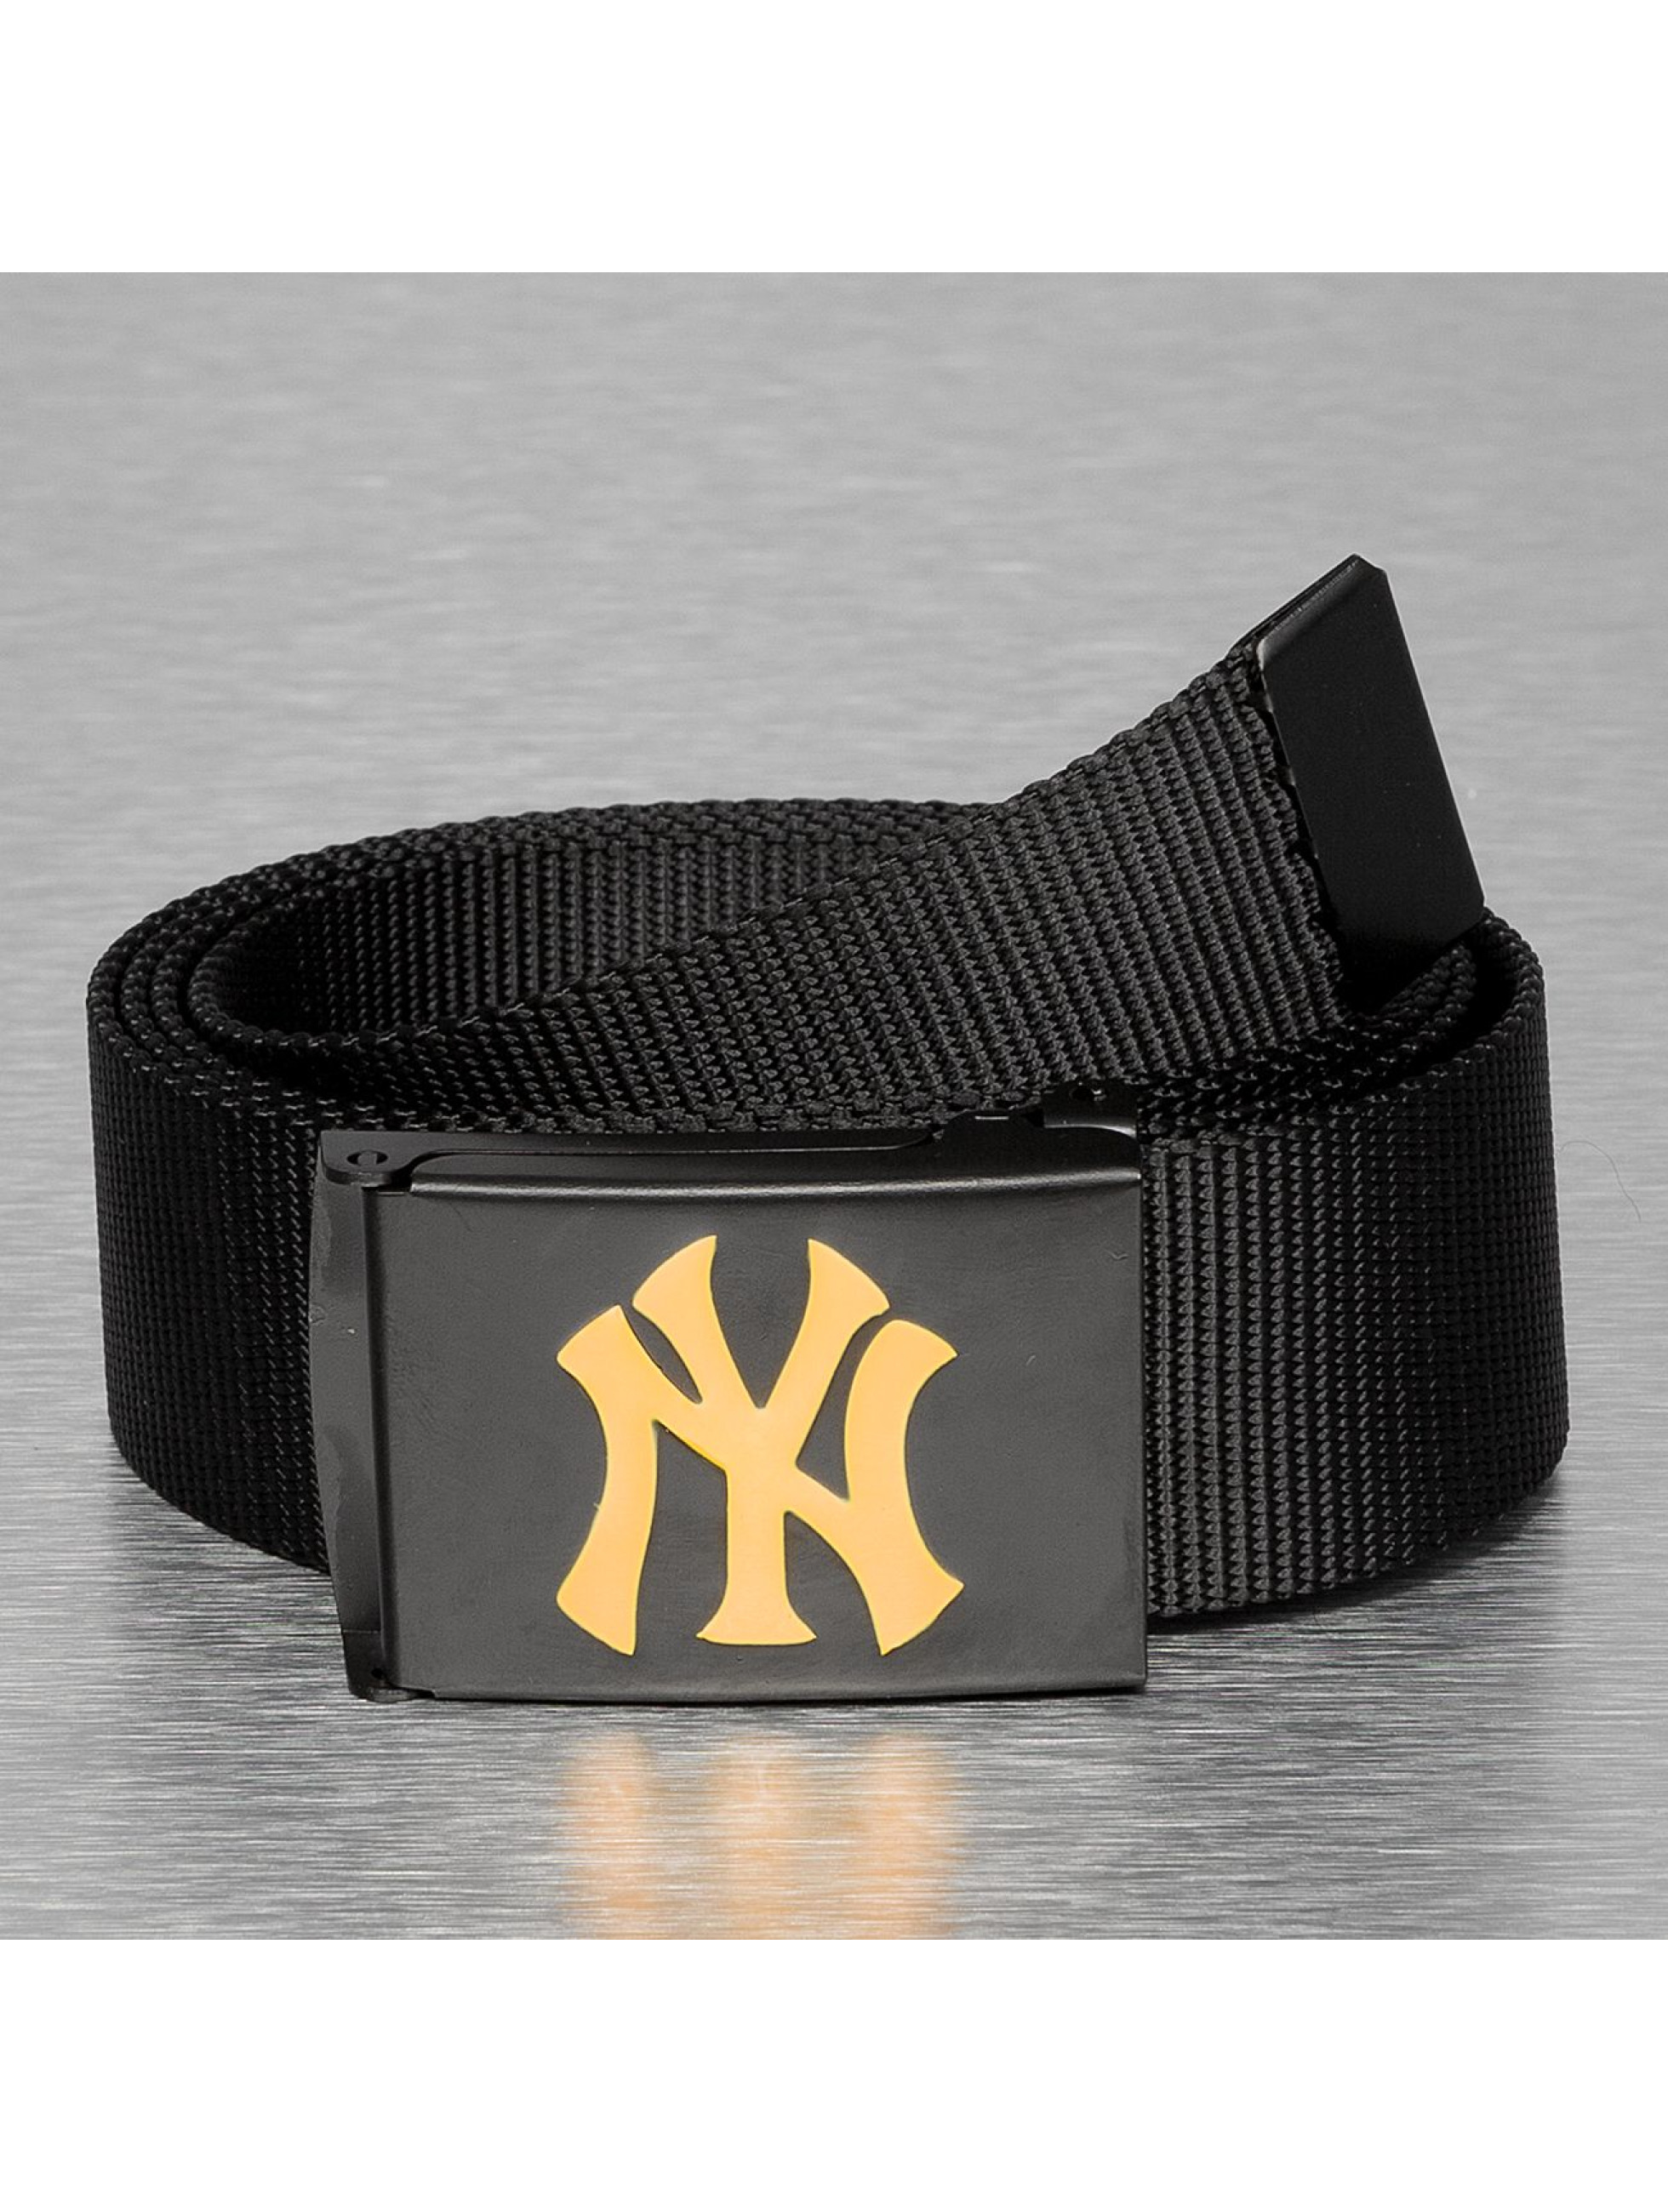 MLB Männer,Frauen Gürtel MLB NY Yankees Premium in schwarz